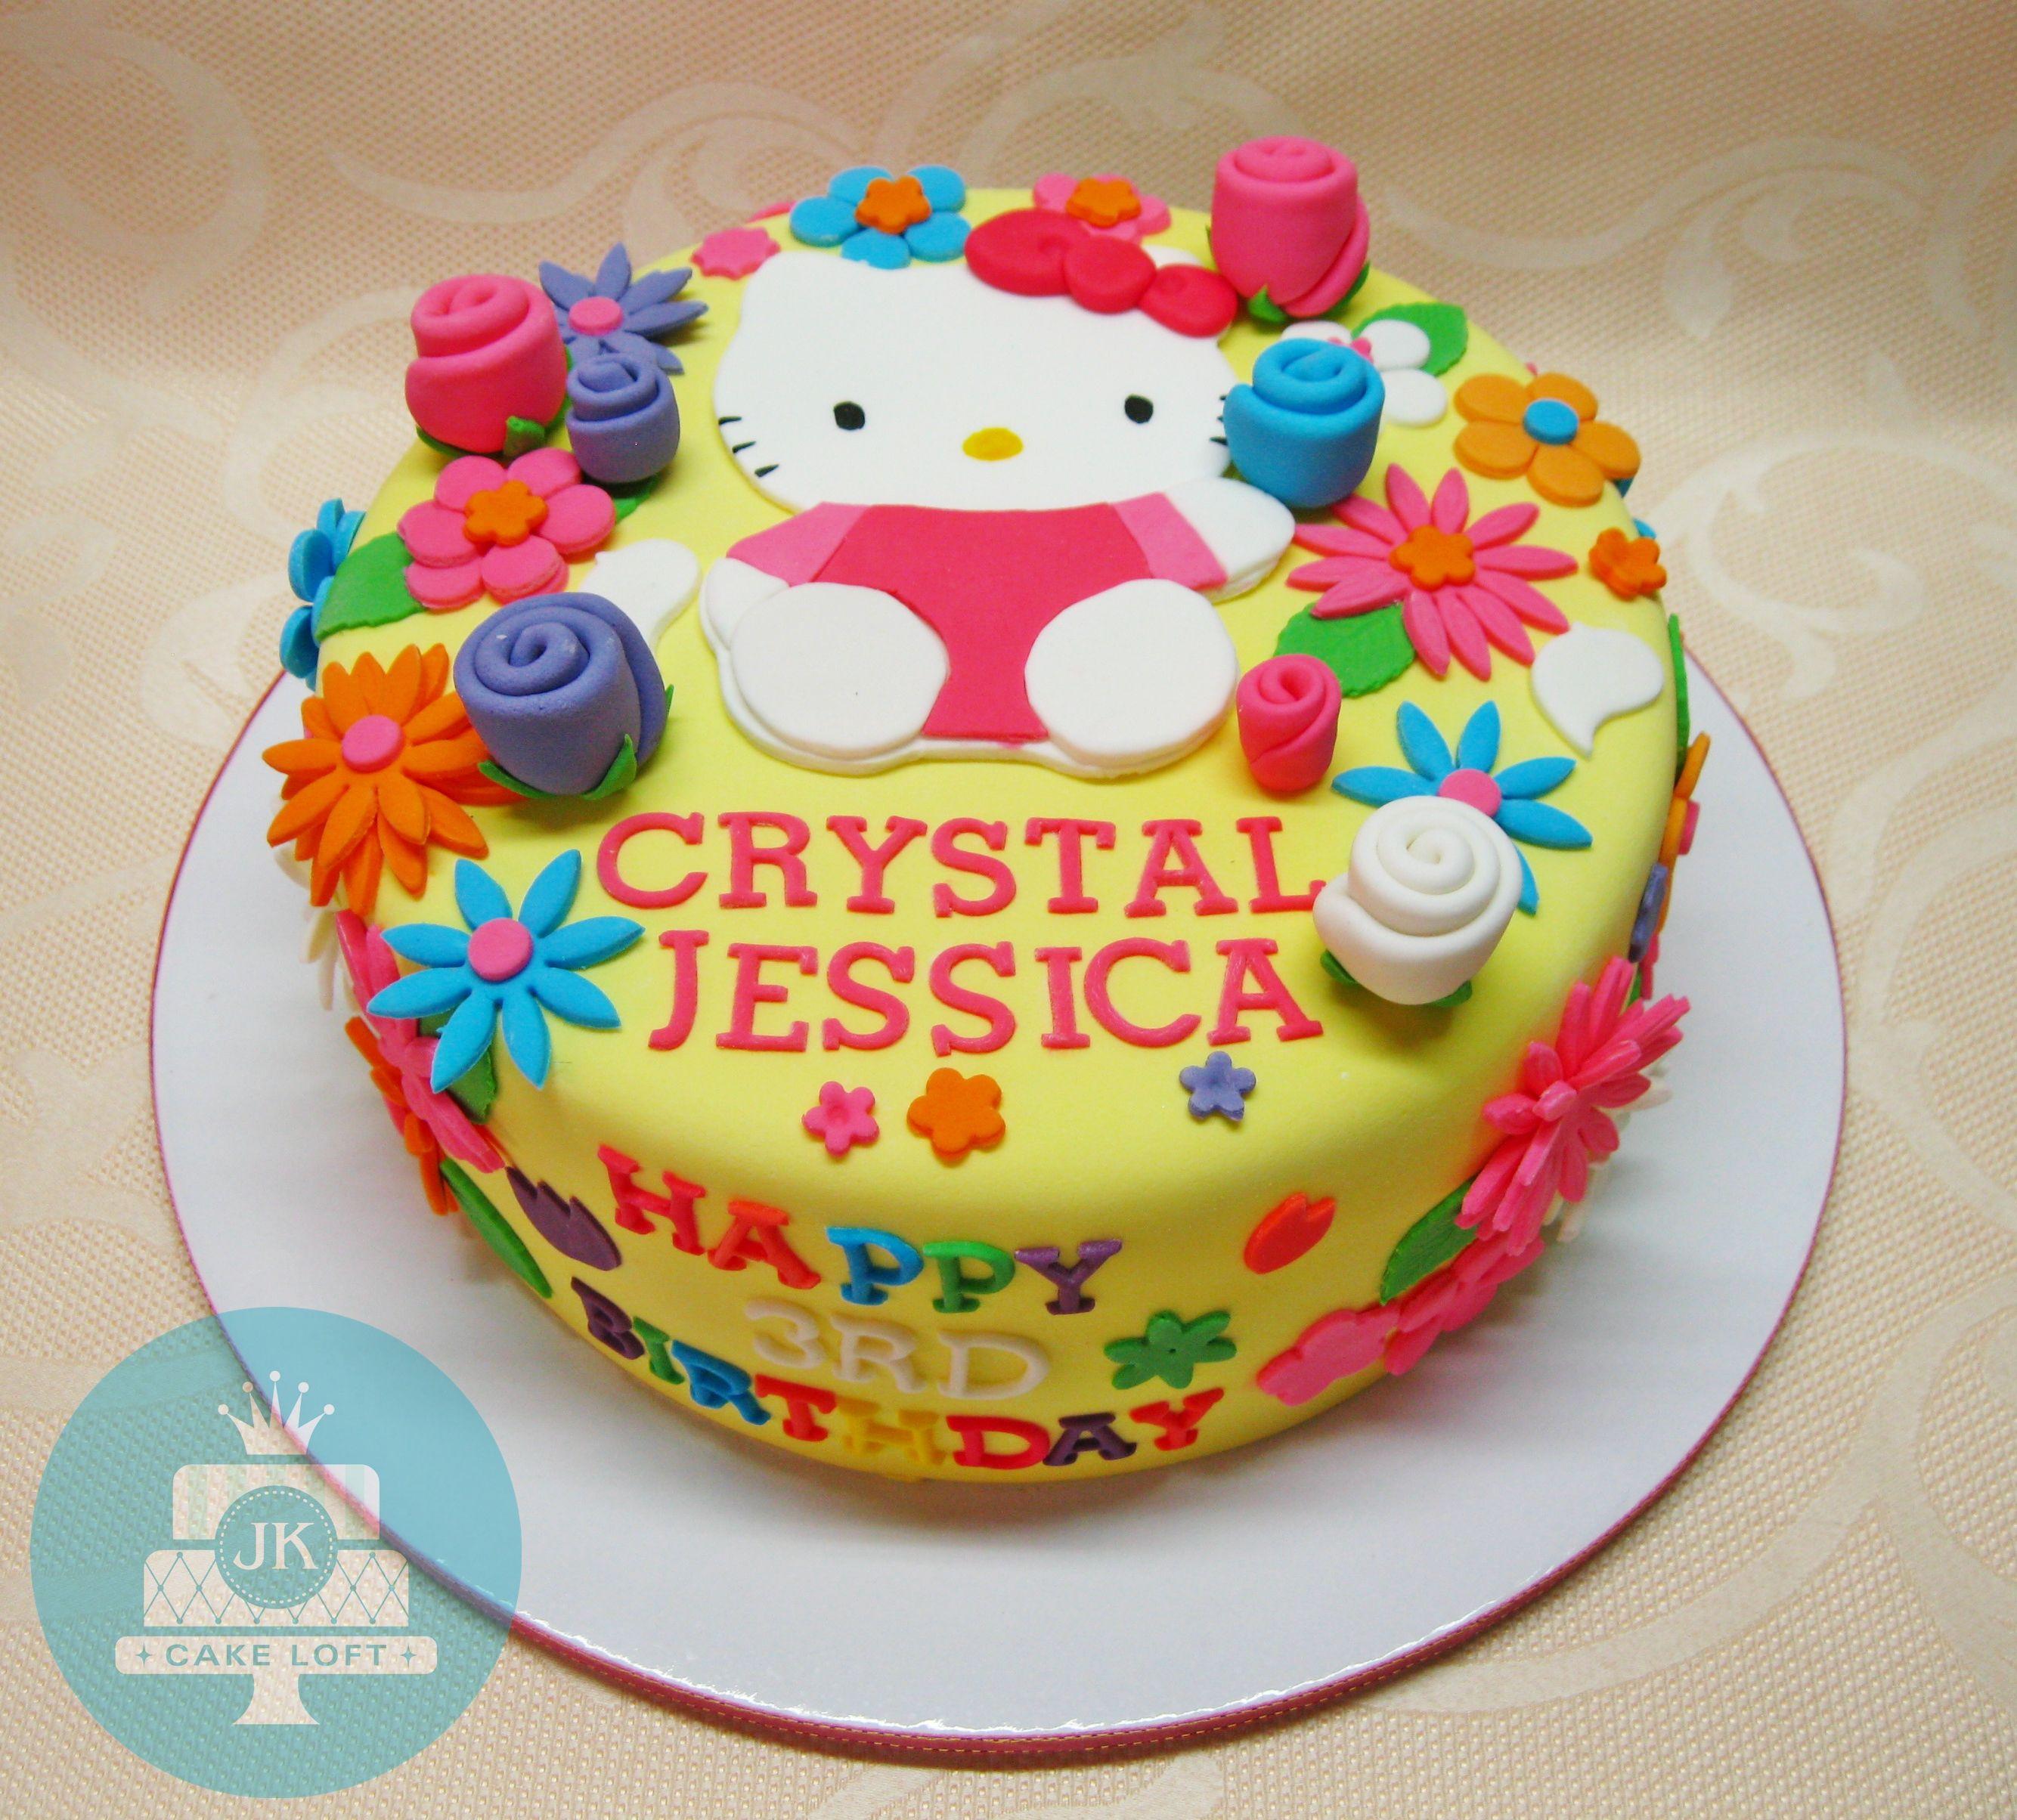 Surprising Hello Kitty Cake Happy Birthday Crystal Jessica Cake Kids Cake Funny Birthday Cards Online Alyptdamsfinfo